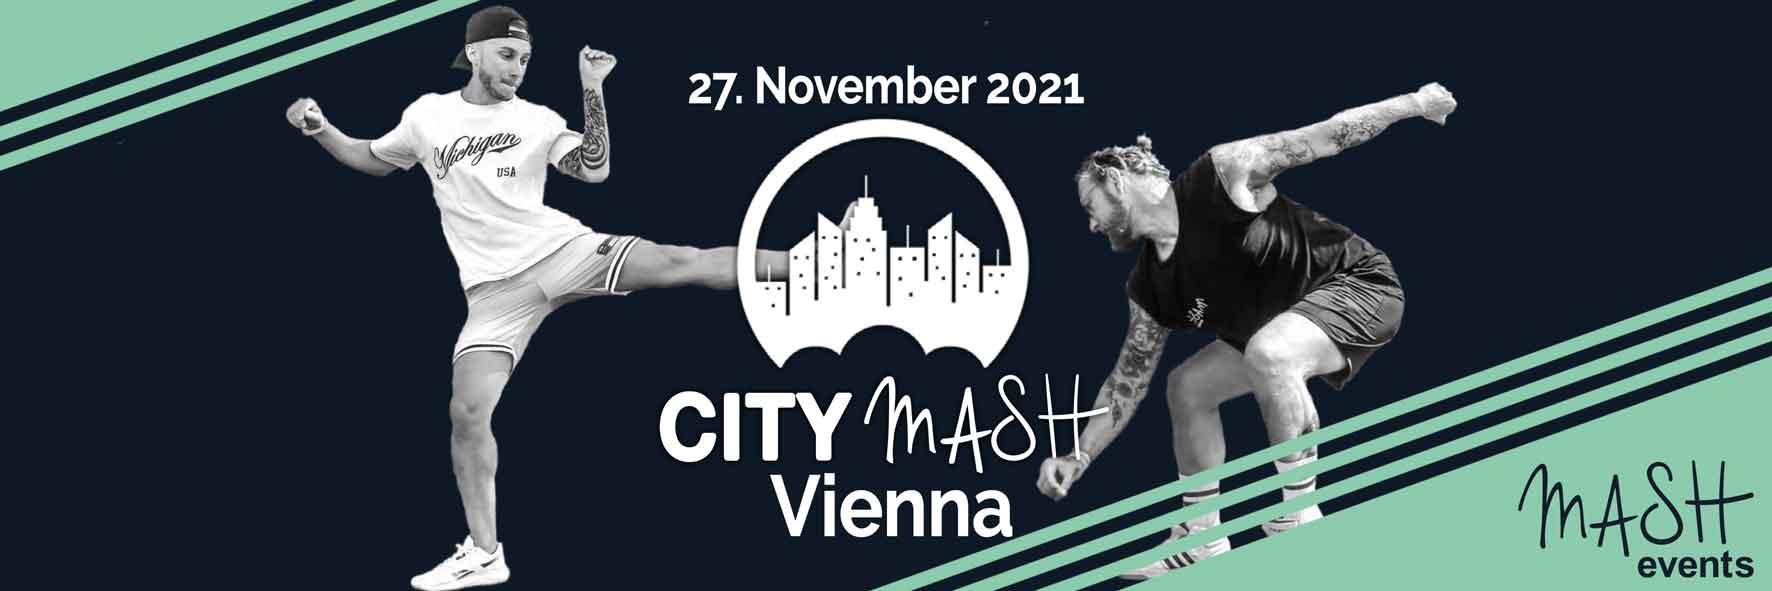 citymash-alexis-web-lang